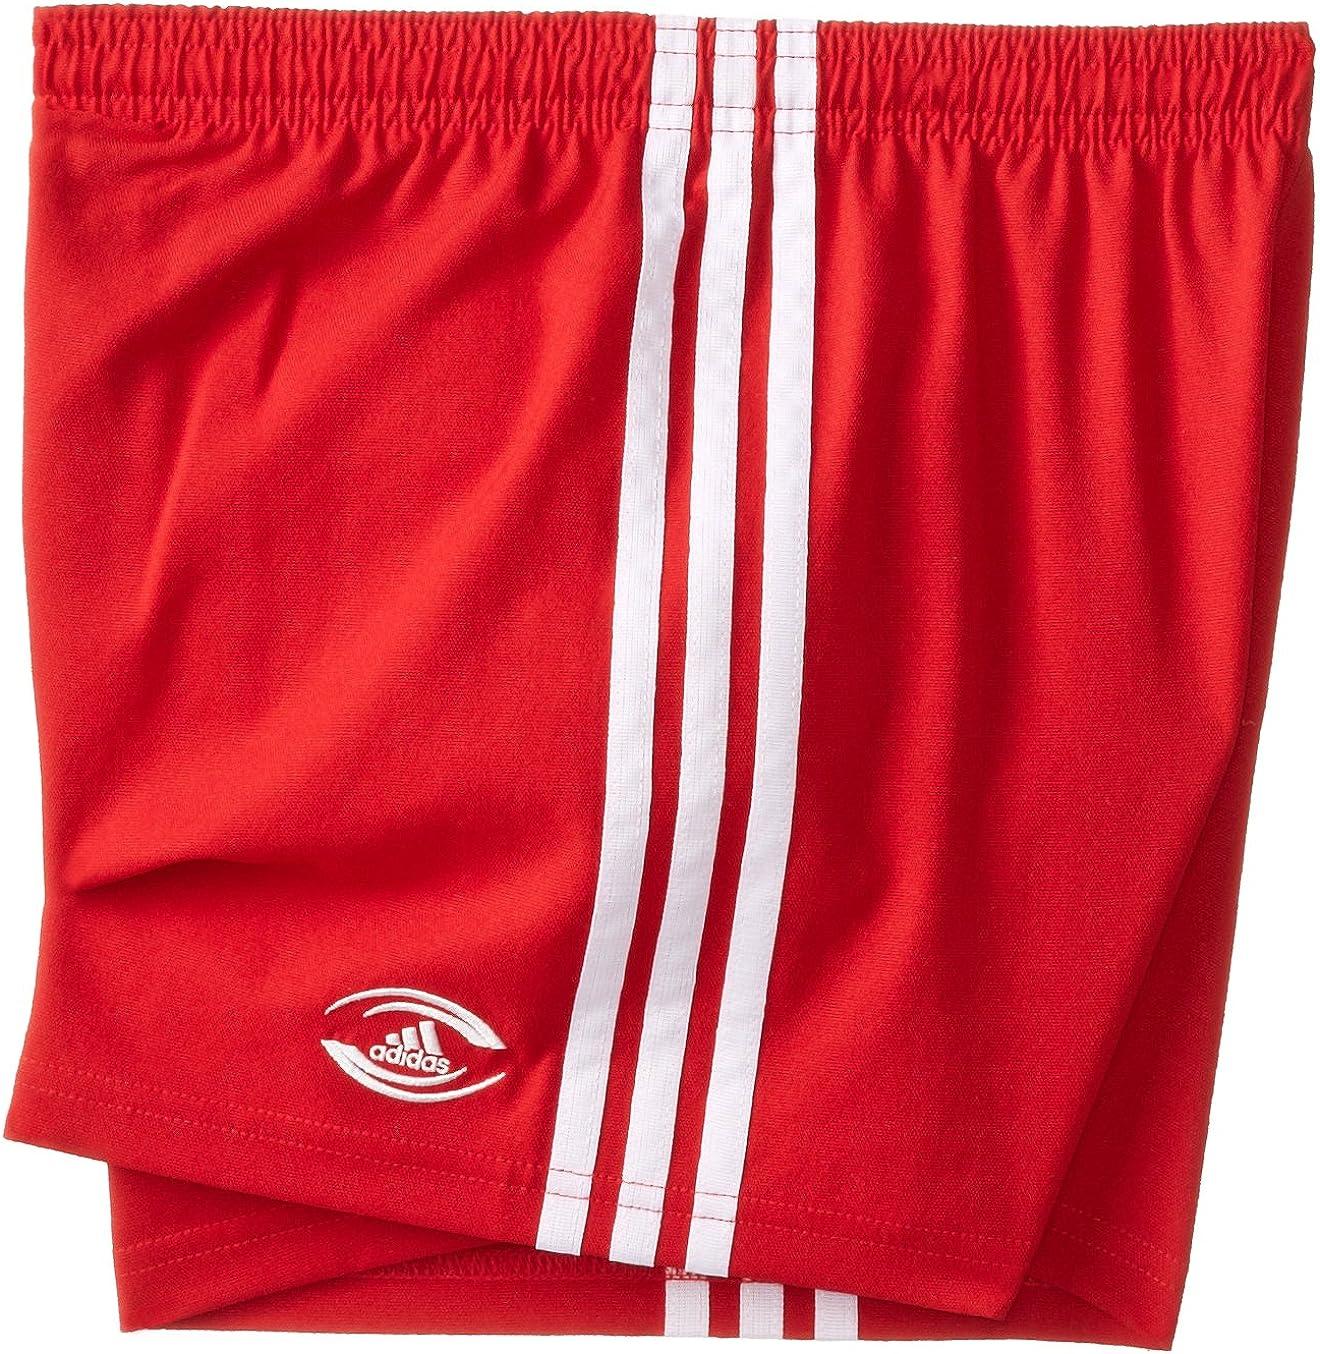 adidas Performance Boys 3 Stripe Shorts